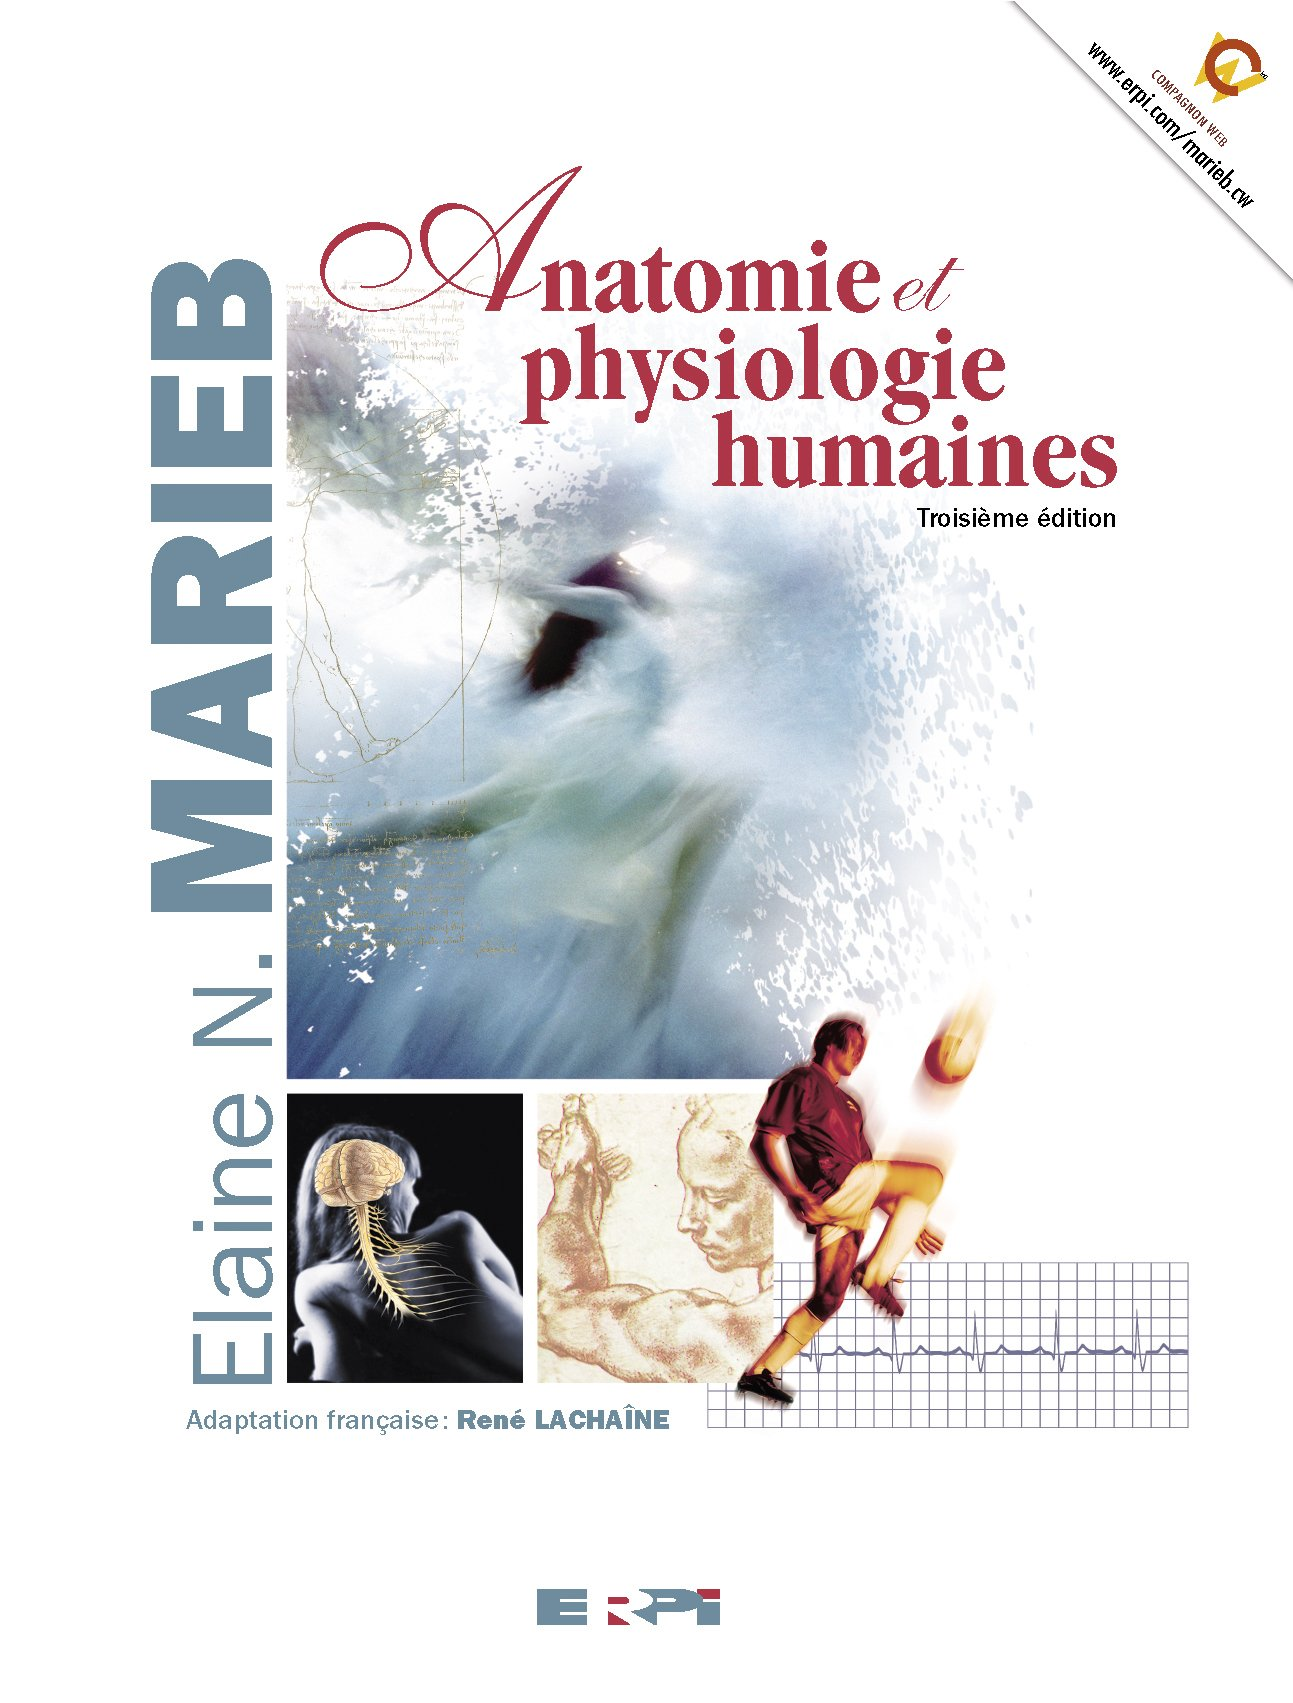 Anatomie & physiologie (3e) marieb: Amazon.co.uk: 9782761315258: Books